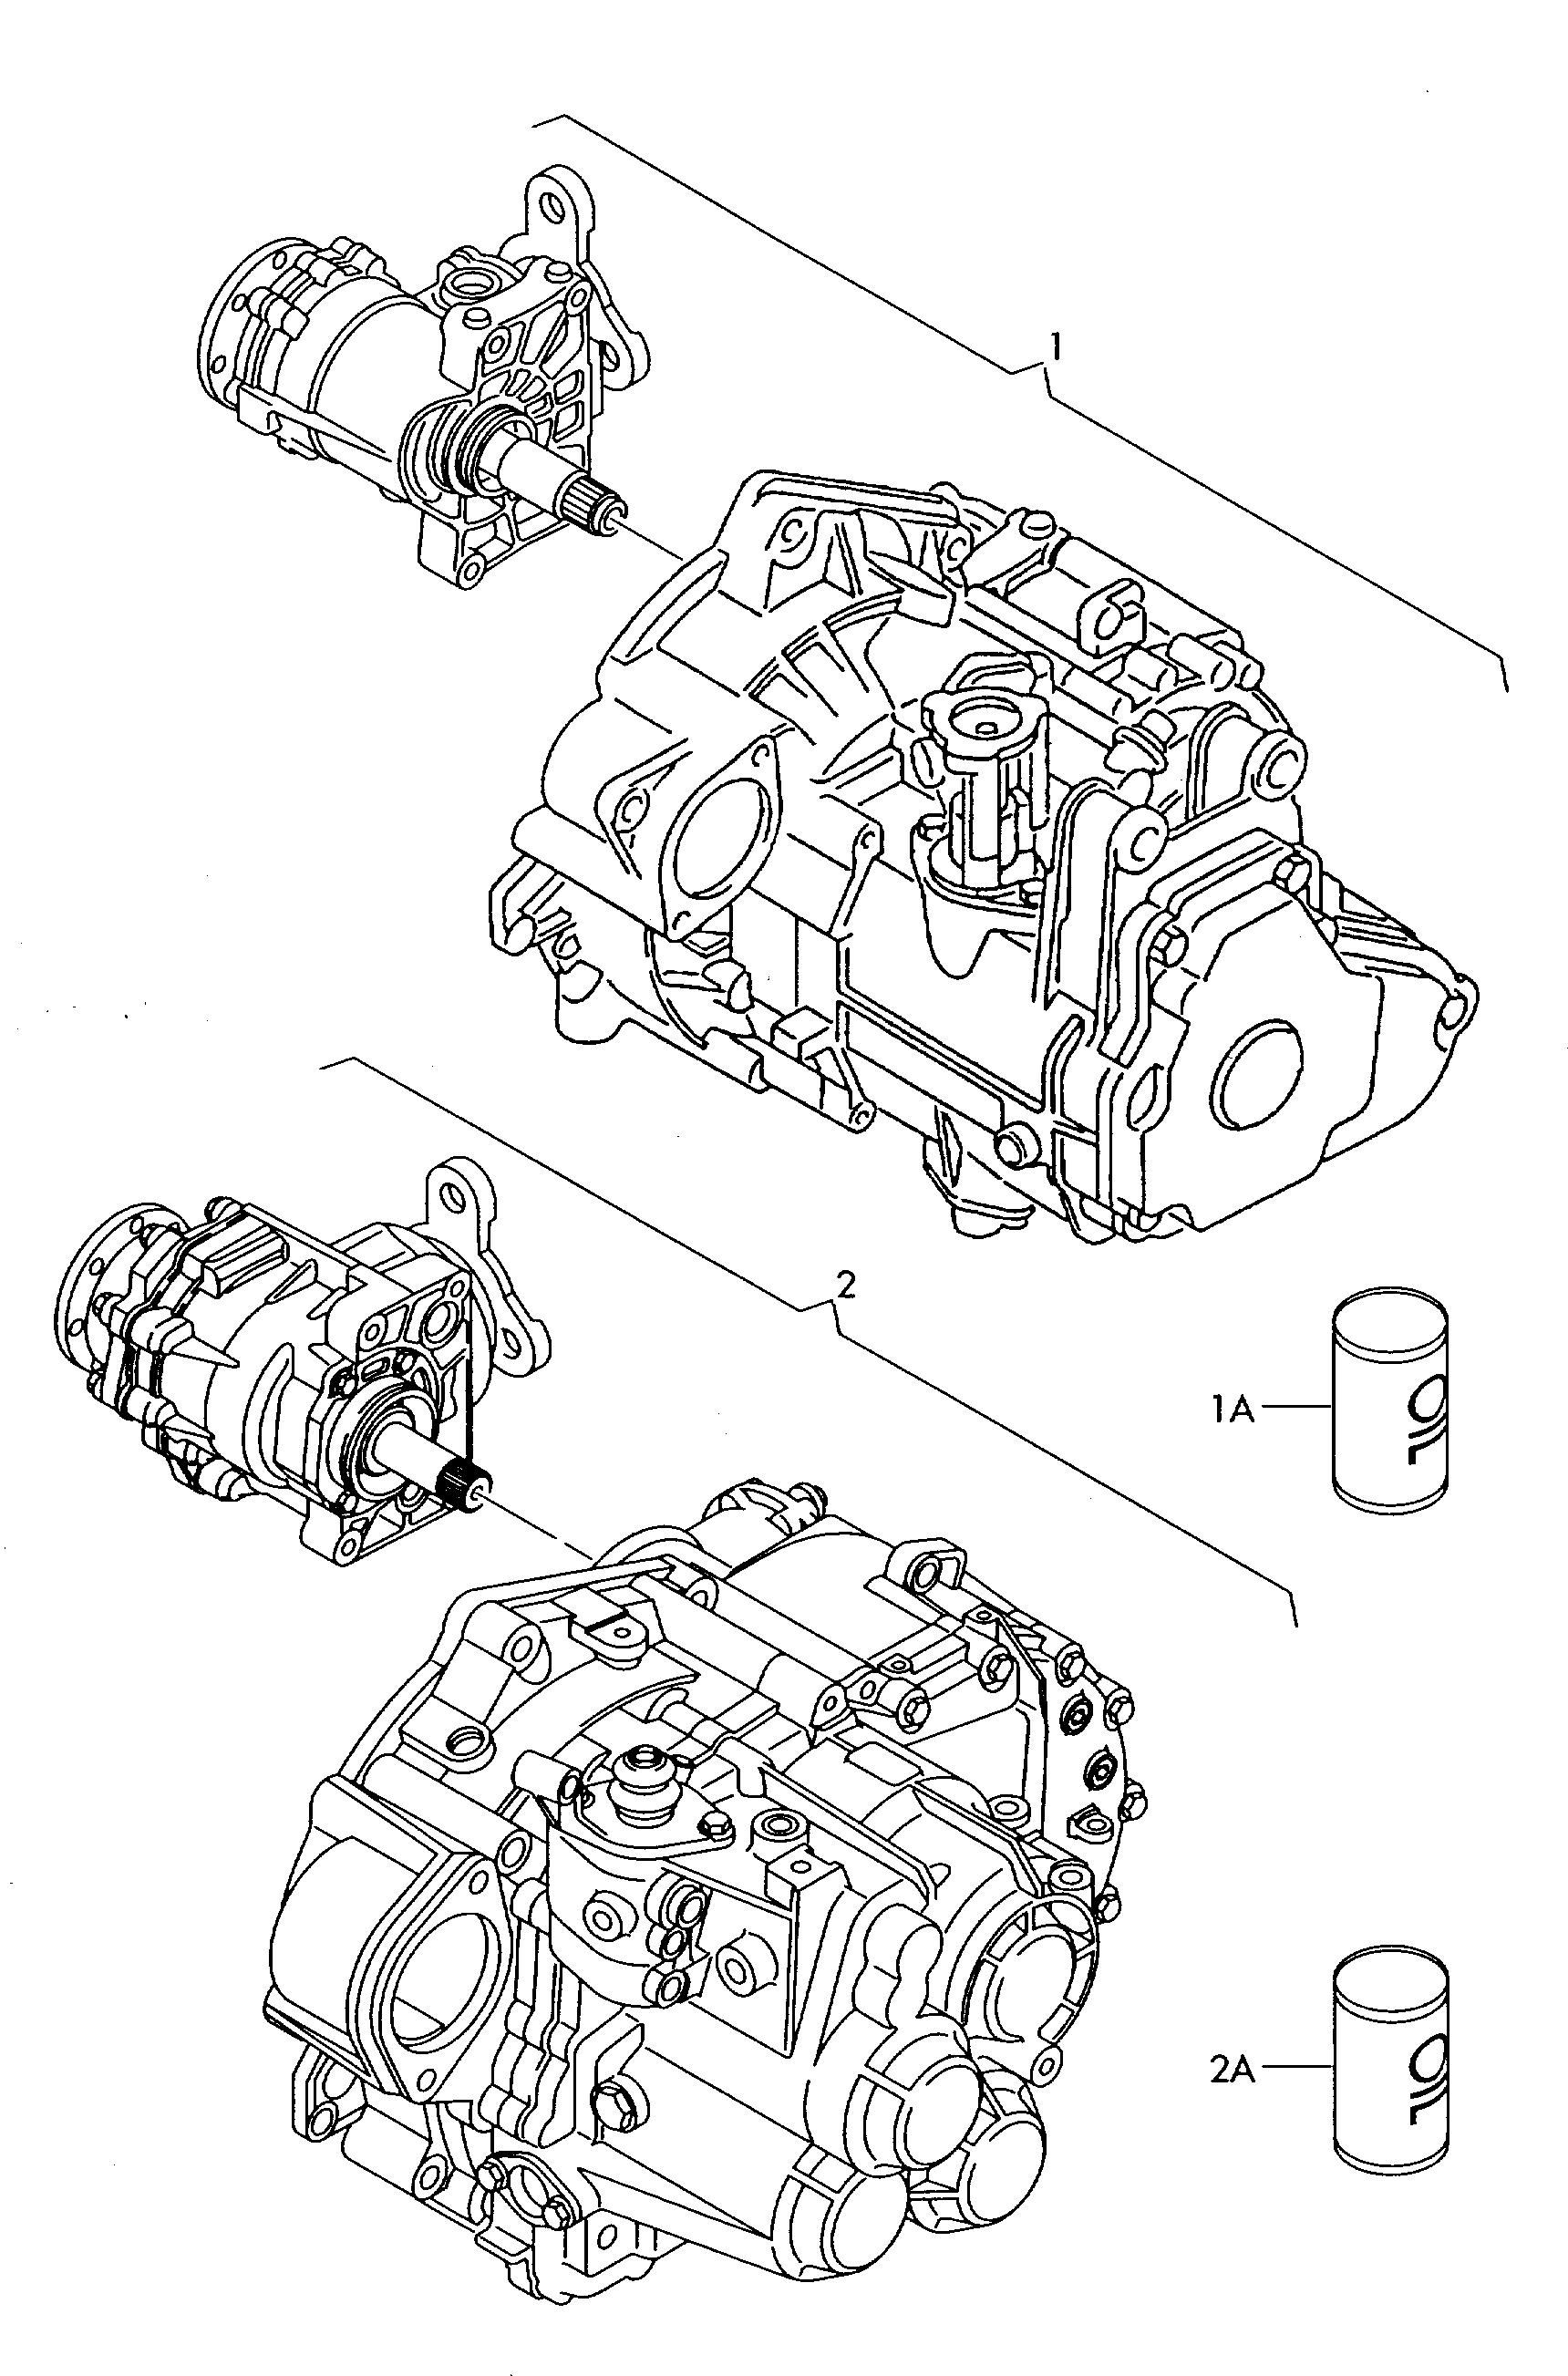 Volkswagen Golf/Golf R32 (2008 - 2009) - for four-wheel